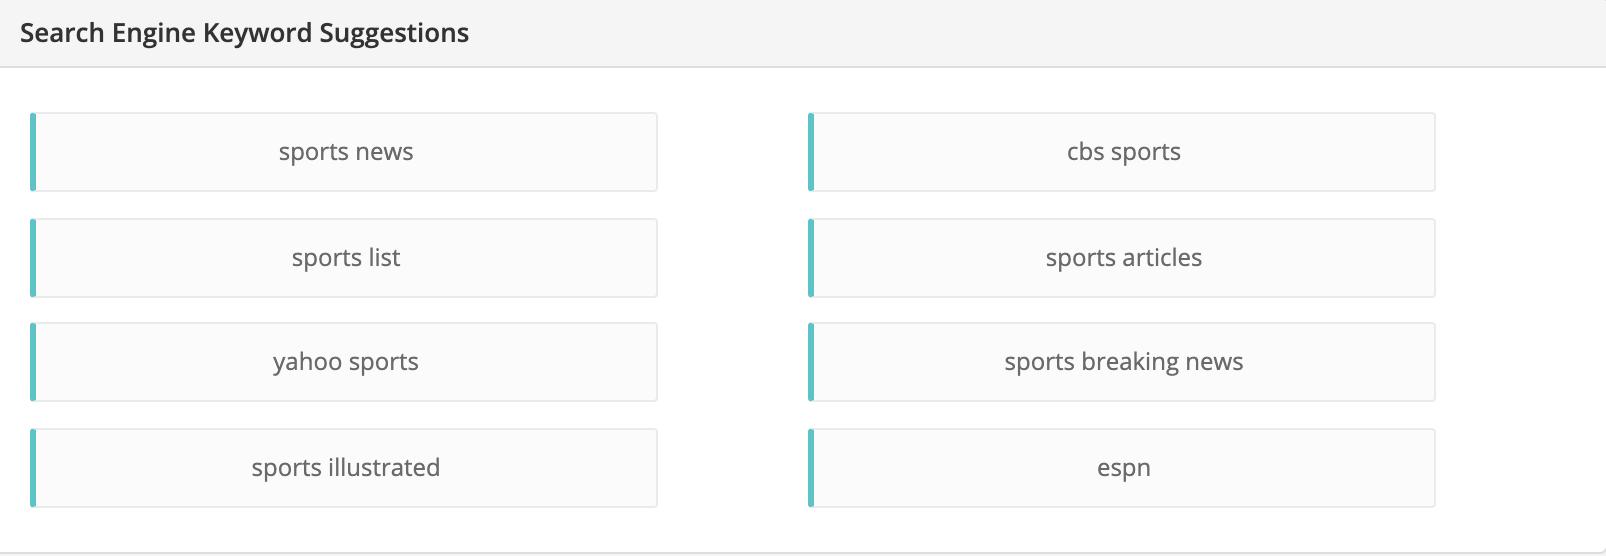 sport niche related keywords